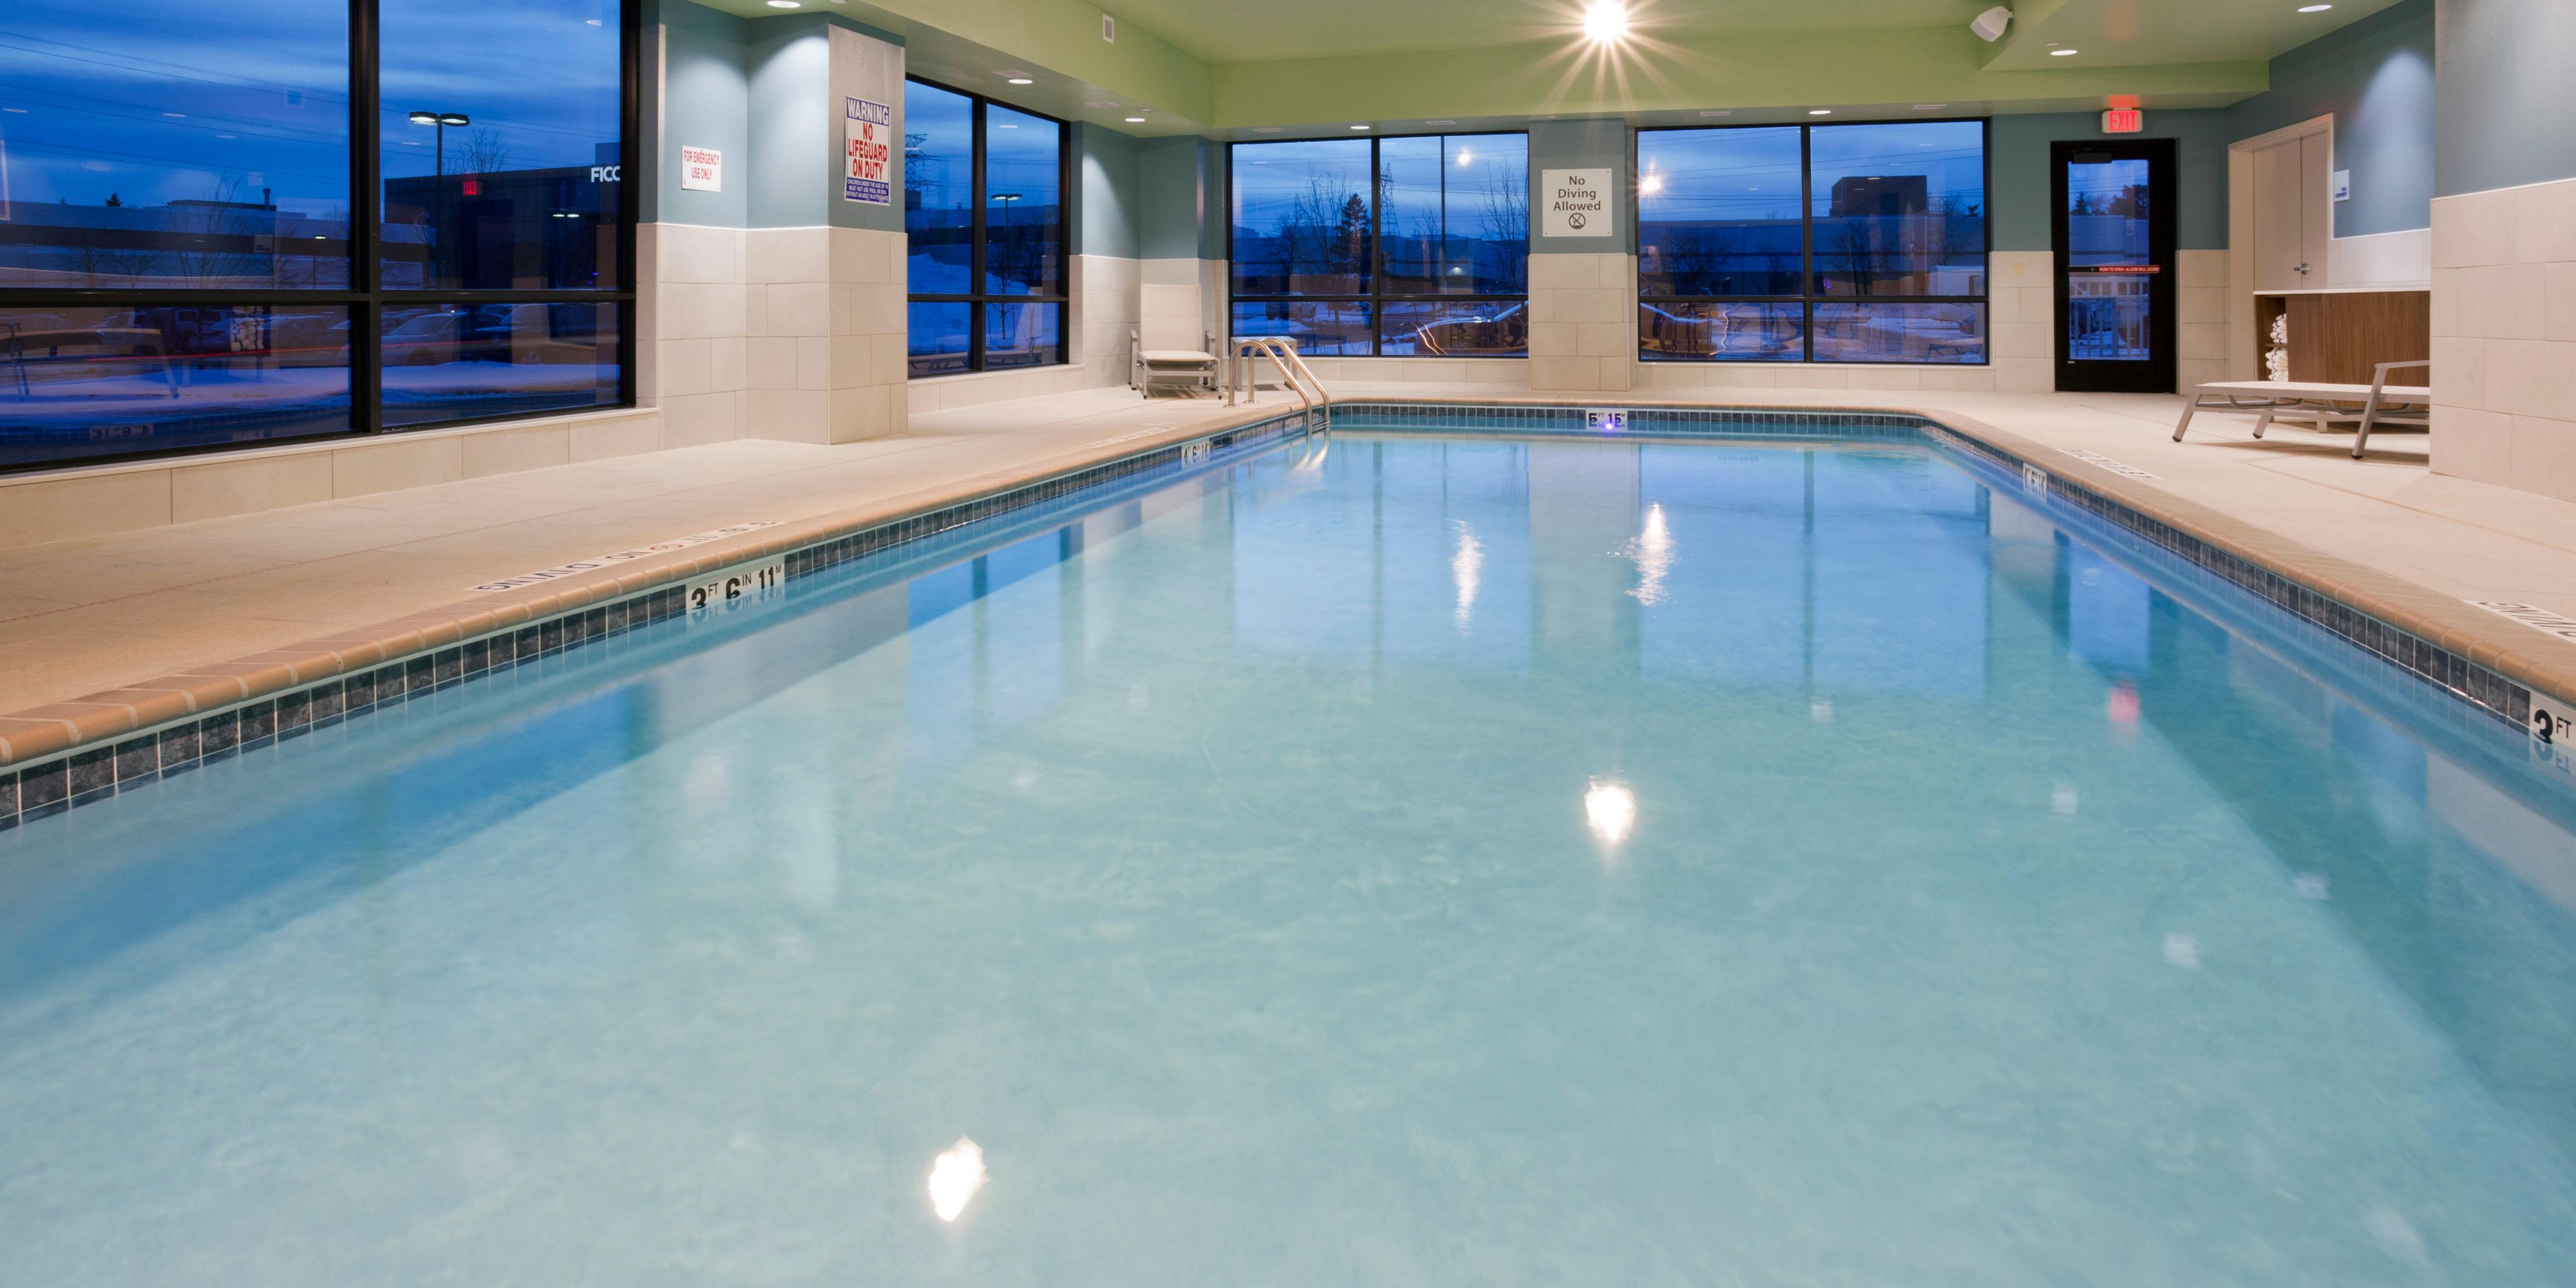 Holiday Inn Express Roseville 4821225099 2x1